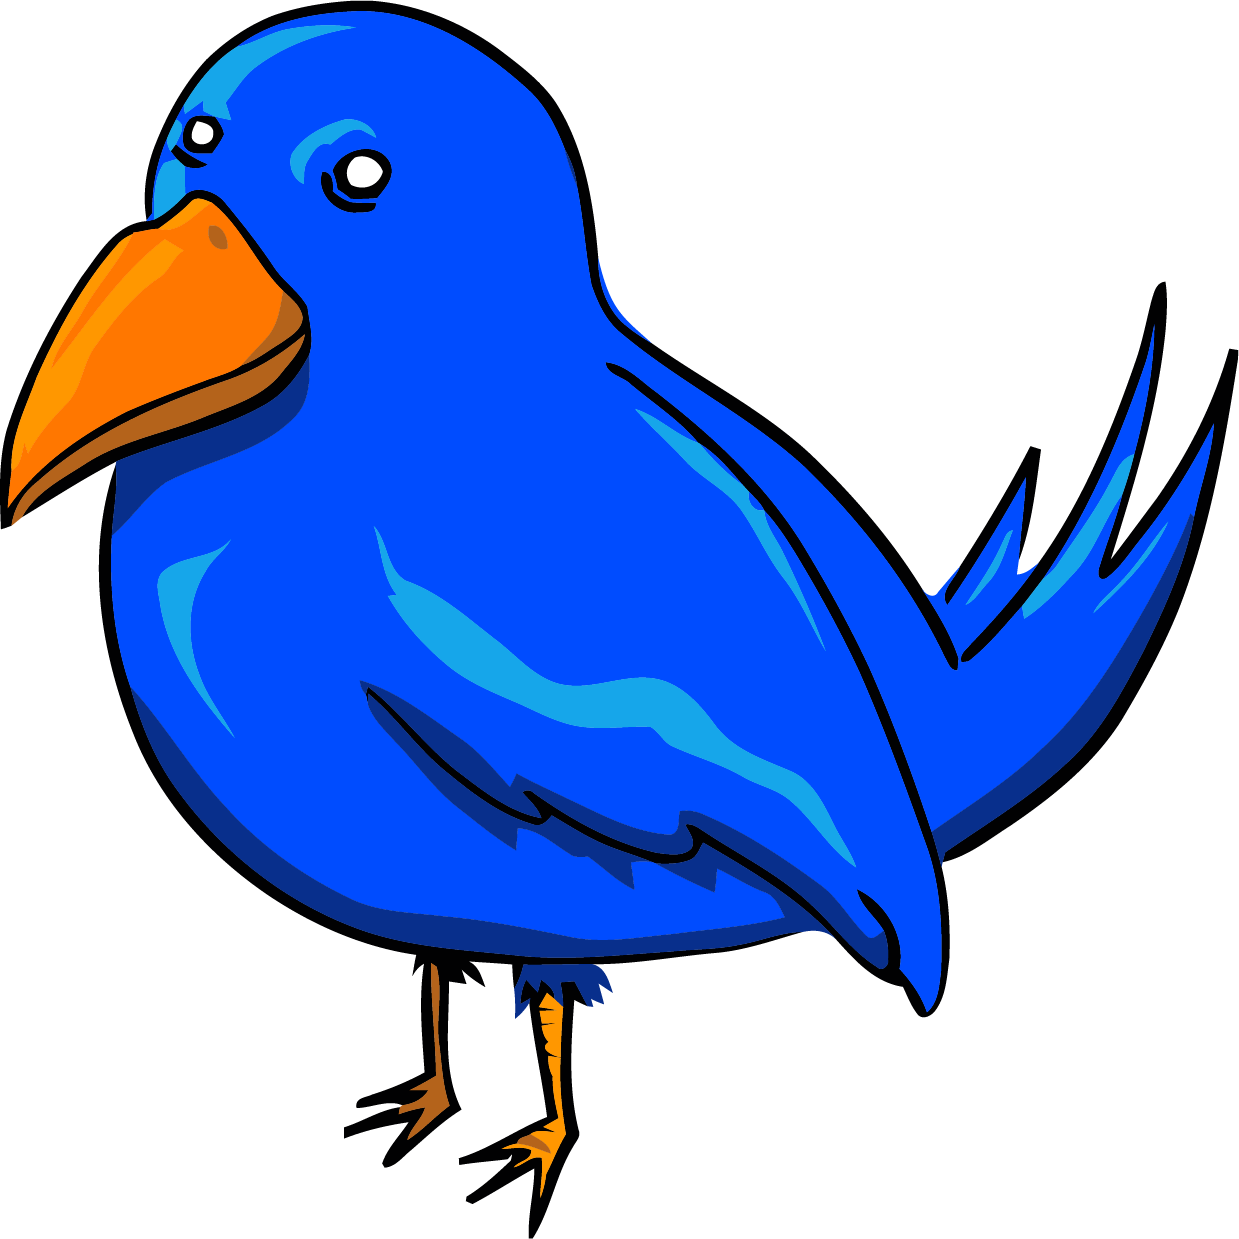 1239x1239 Bird Face Clip Art Cute Birds Clipart Black And White Png